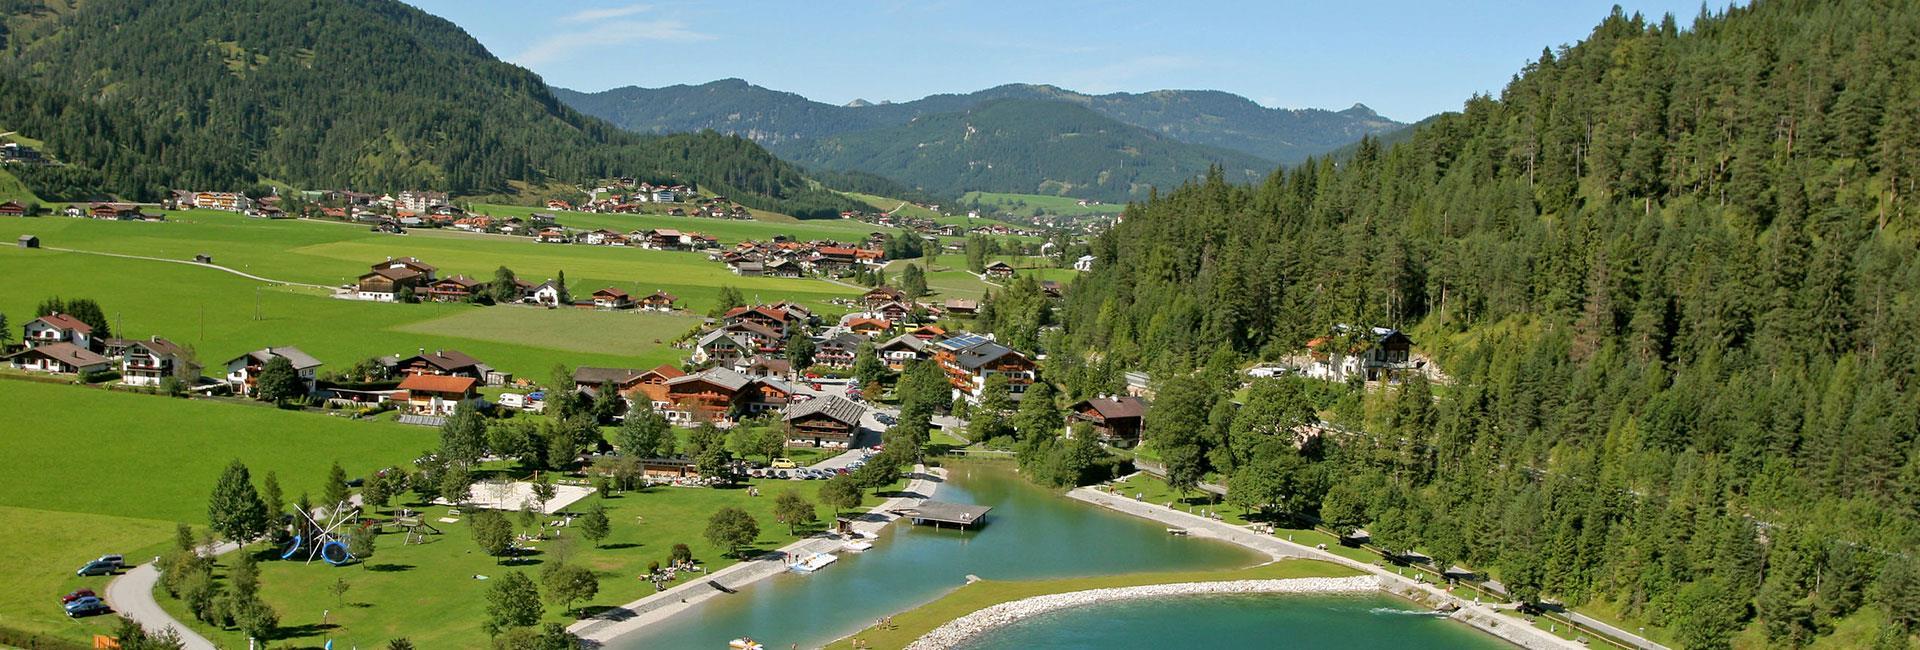 Accommodation Christlum Achenkirch - Achensee - BERGFEX